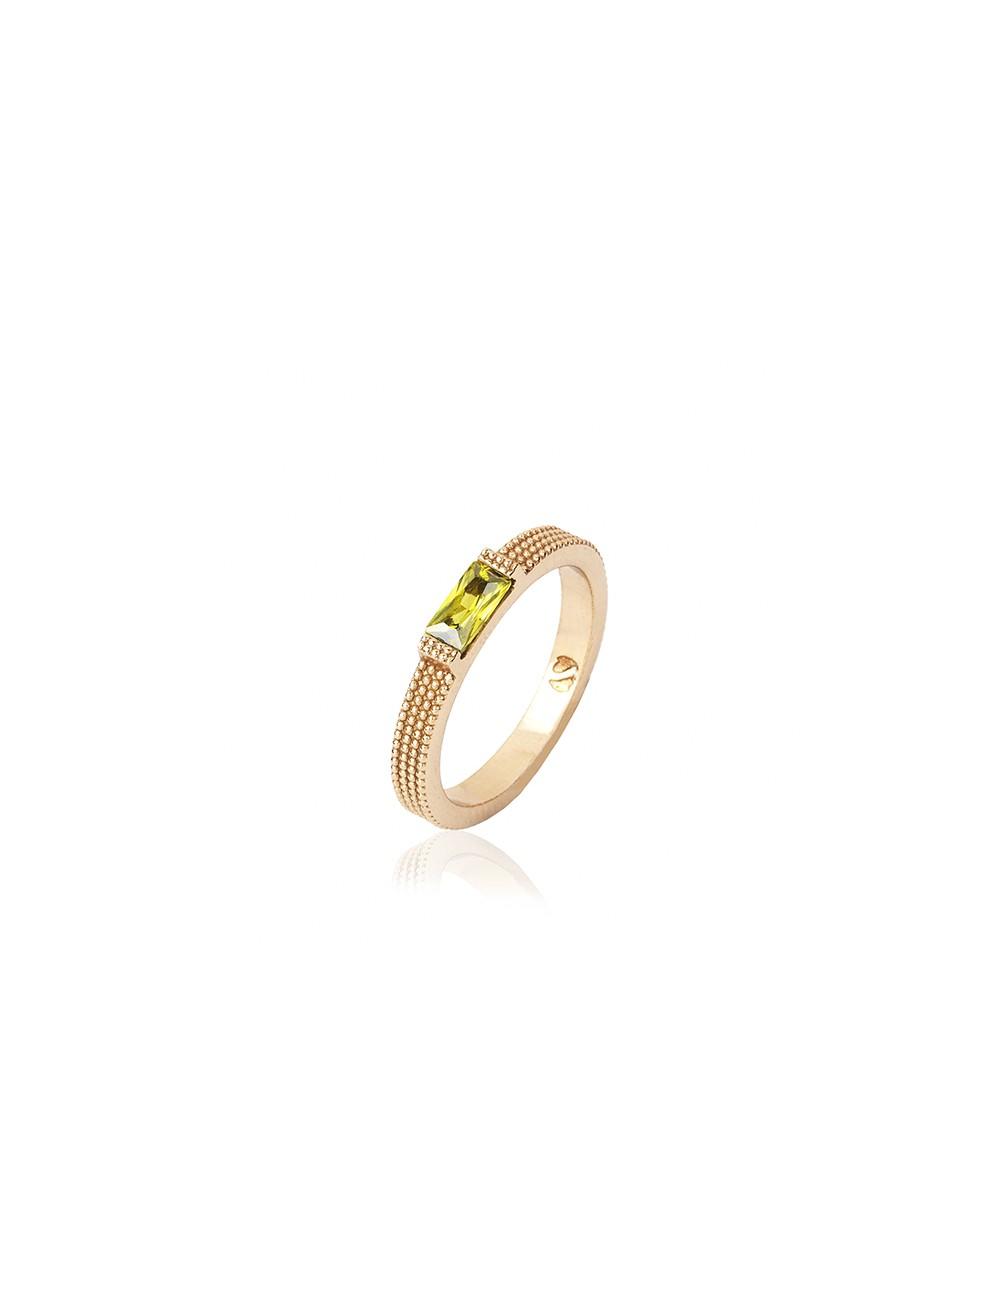 YBD22372900200U - Pendientes Gucci Icon Twirl de Oro amarillo